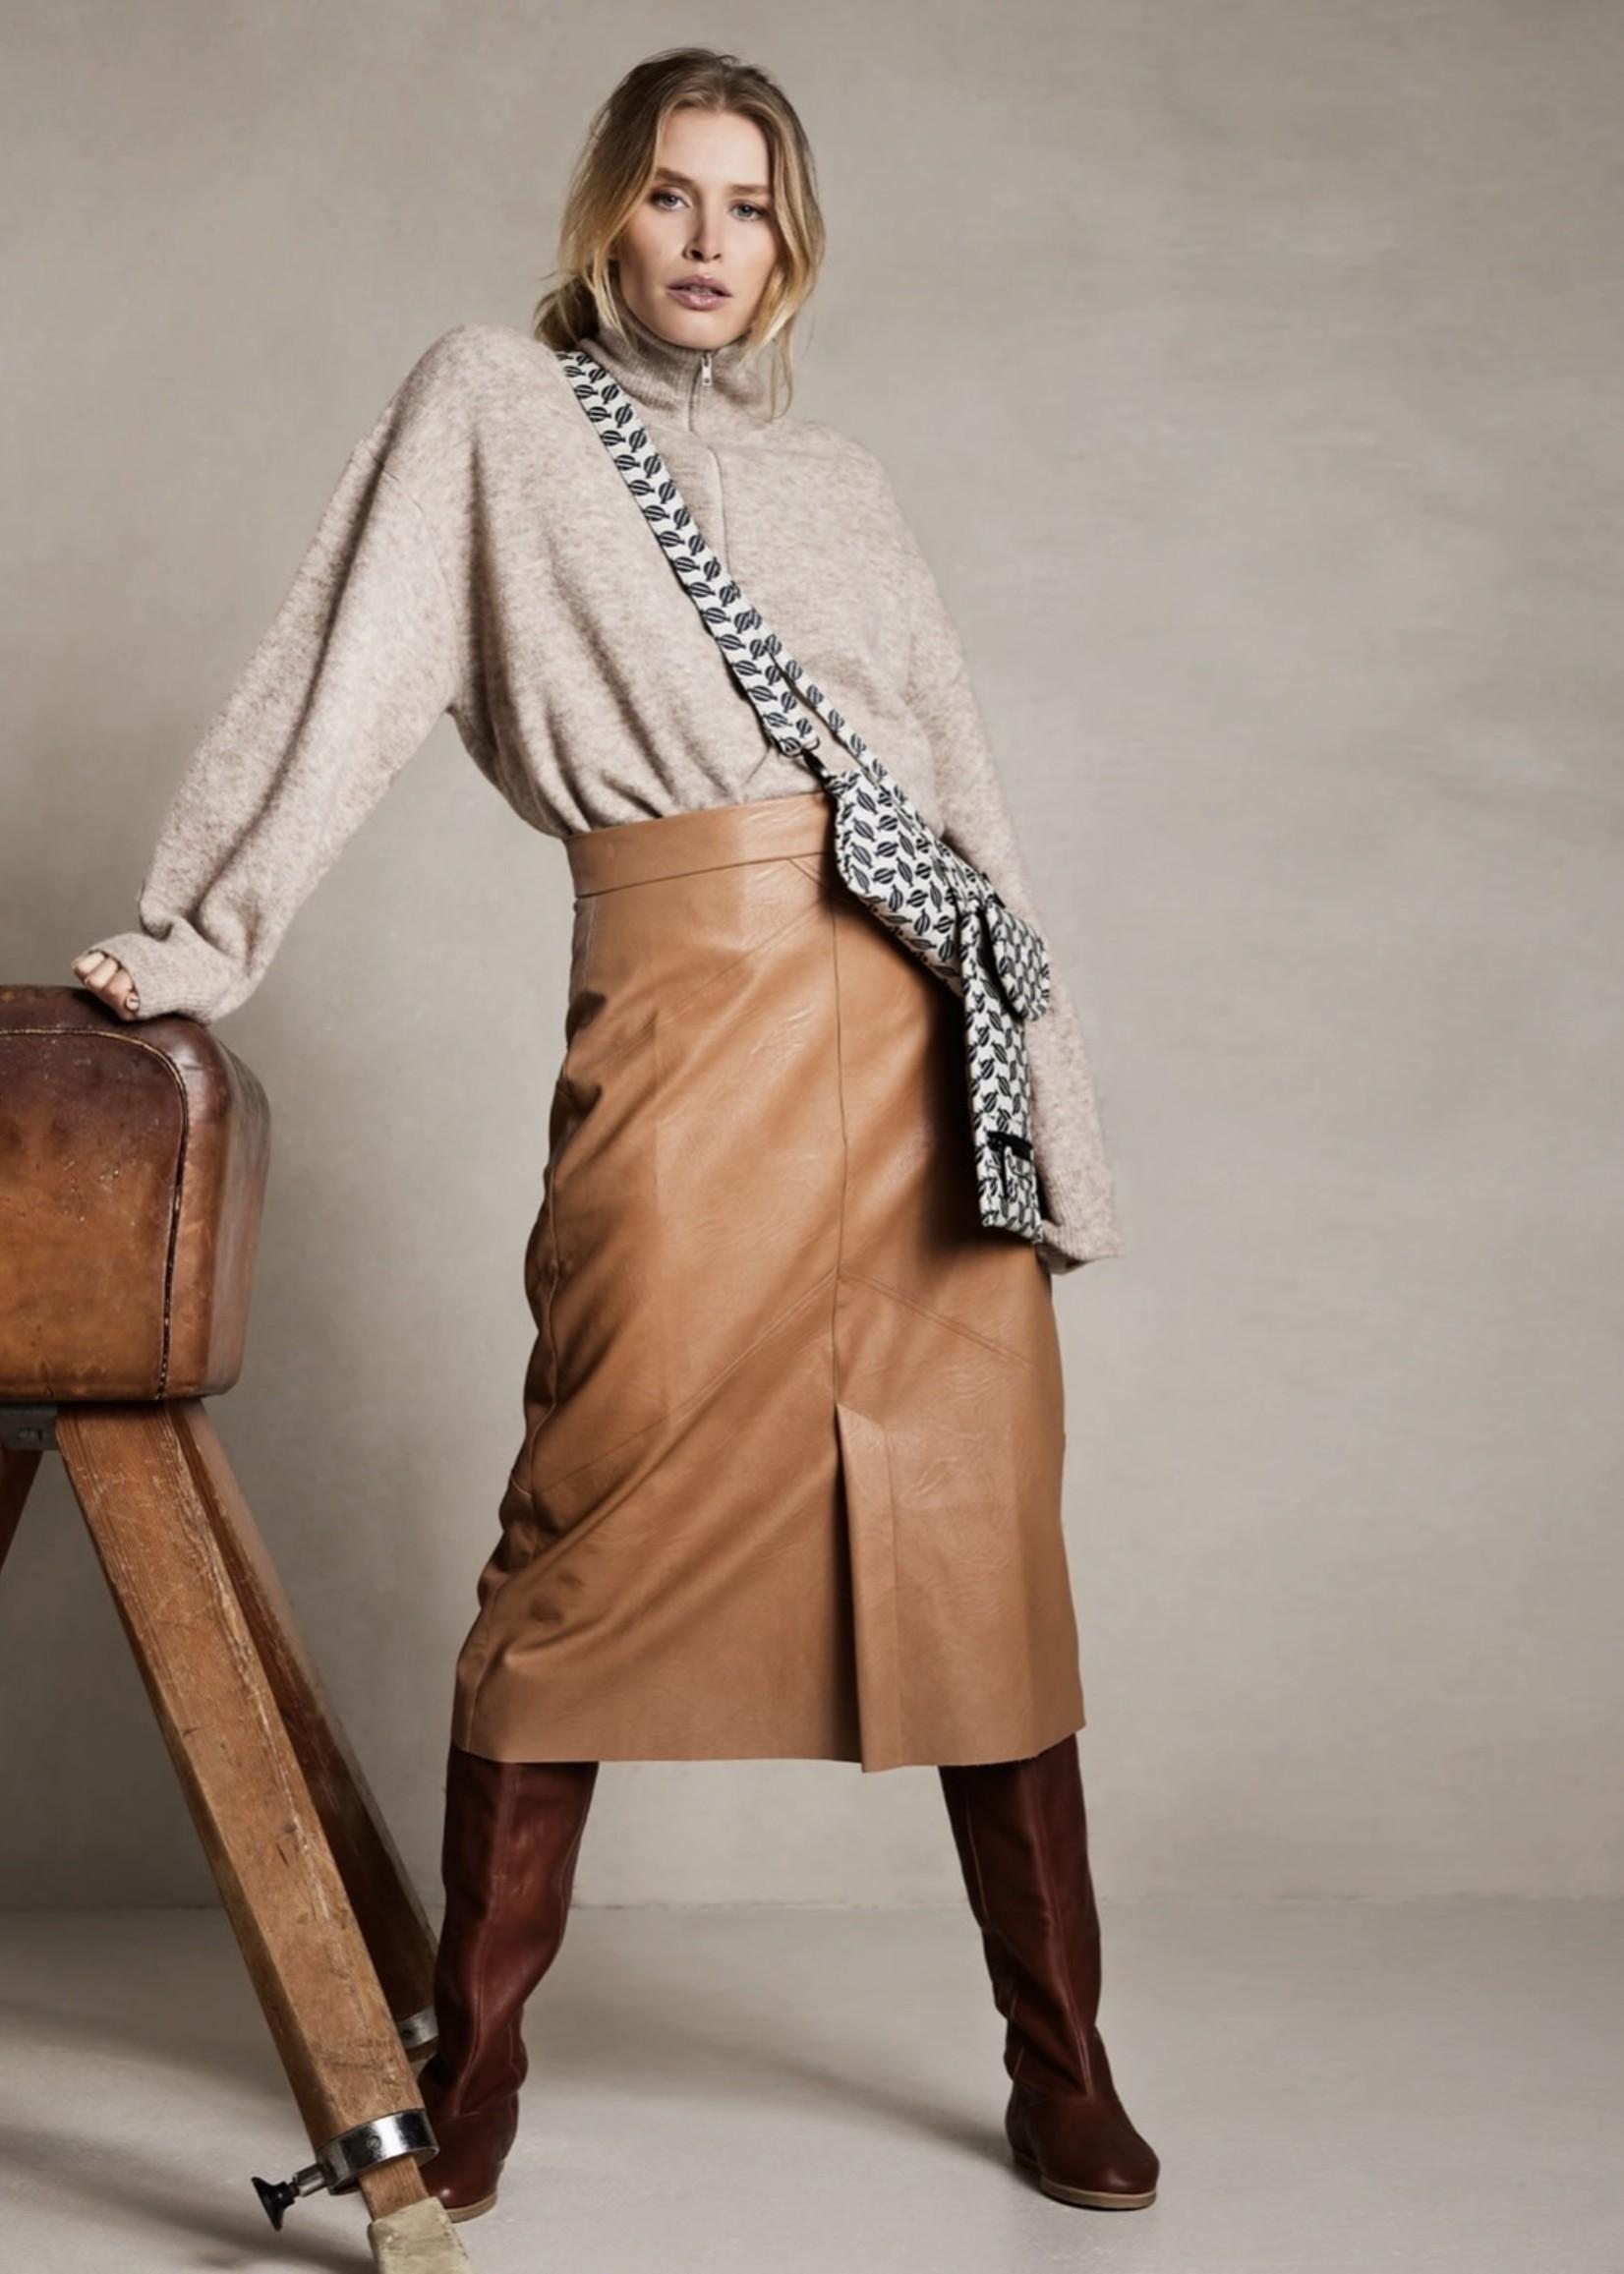 Guts & Goats Vegan Leather Skirt